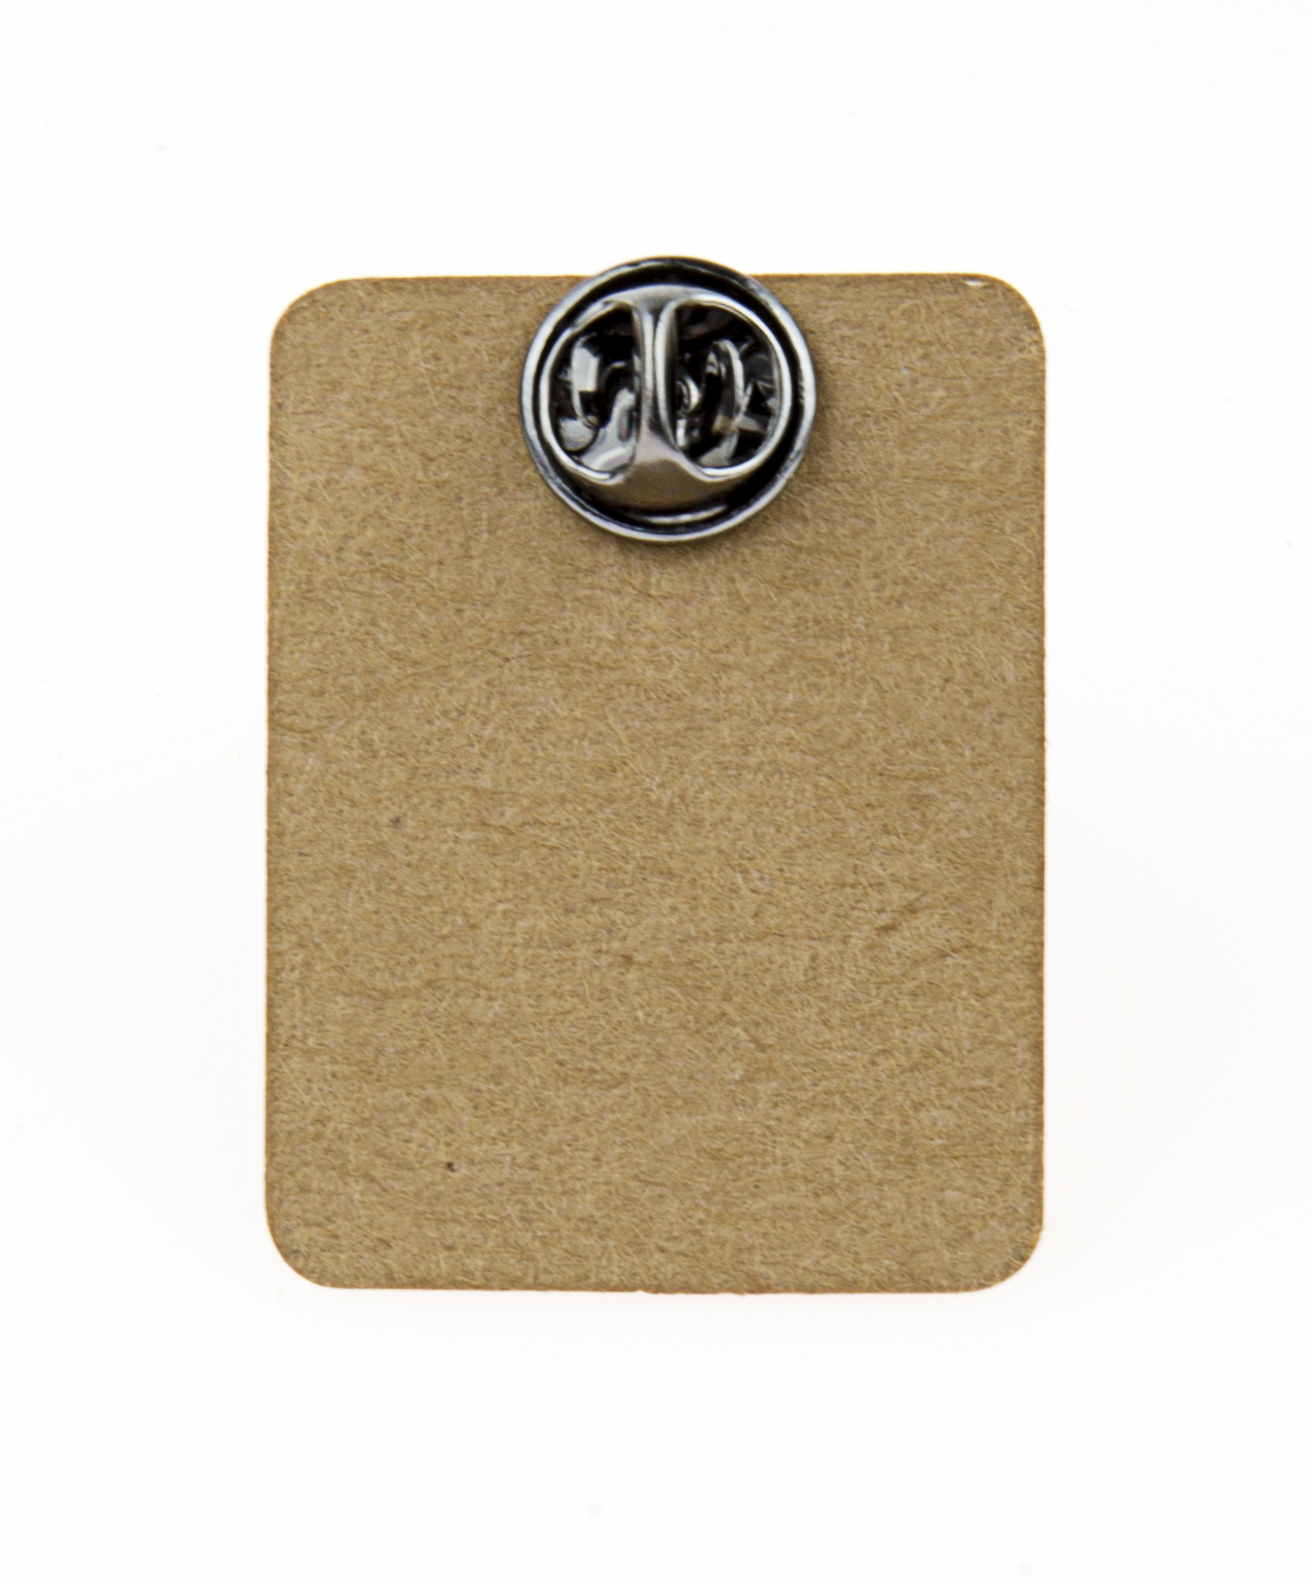 Metal Alien Jesus Enamel Pin Badge